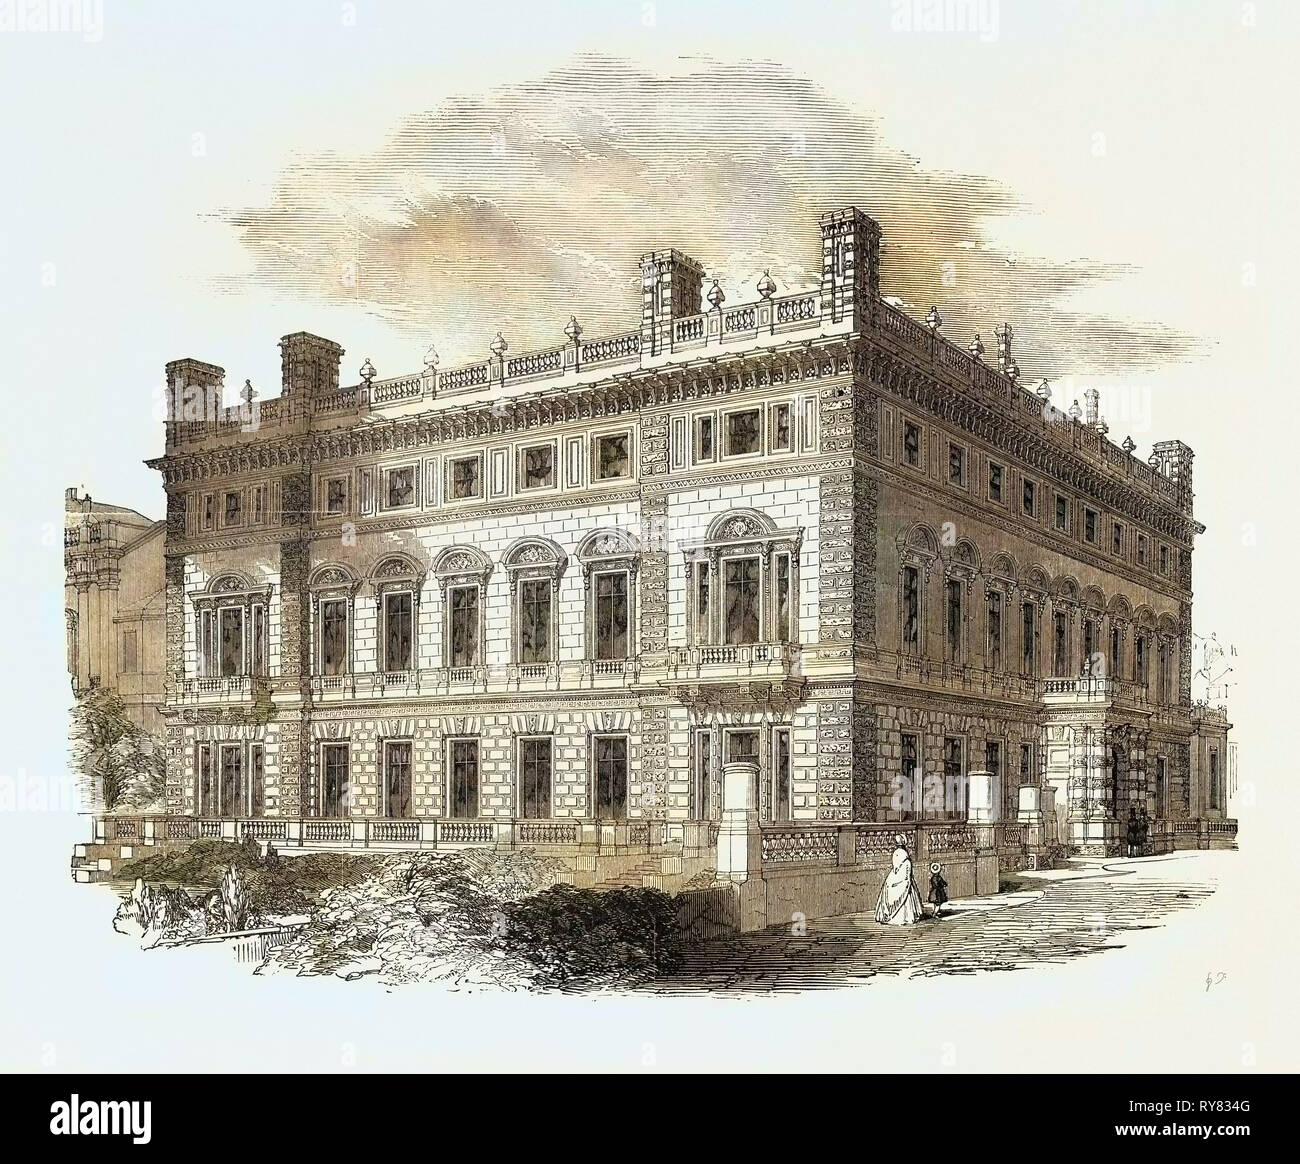 Bridgewater House, Architect, Charles Barry, Esq., R.A - Stock Image